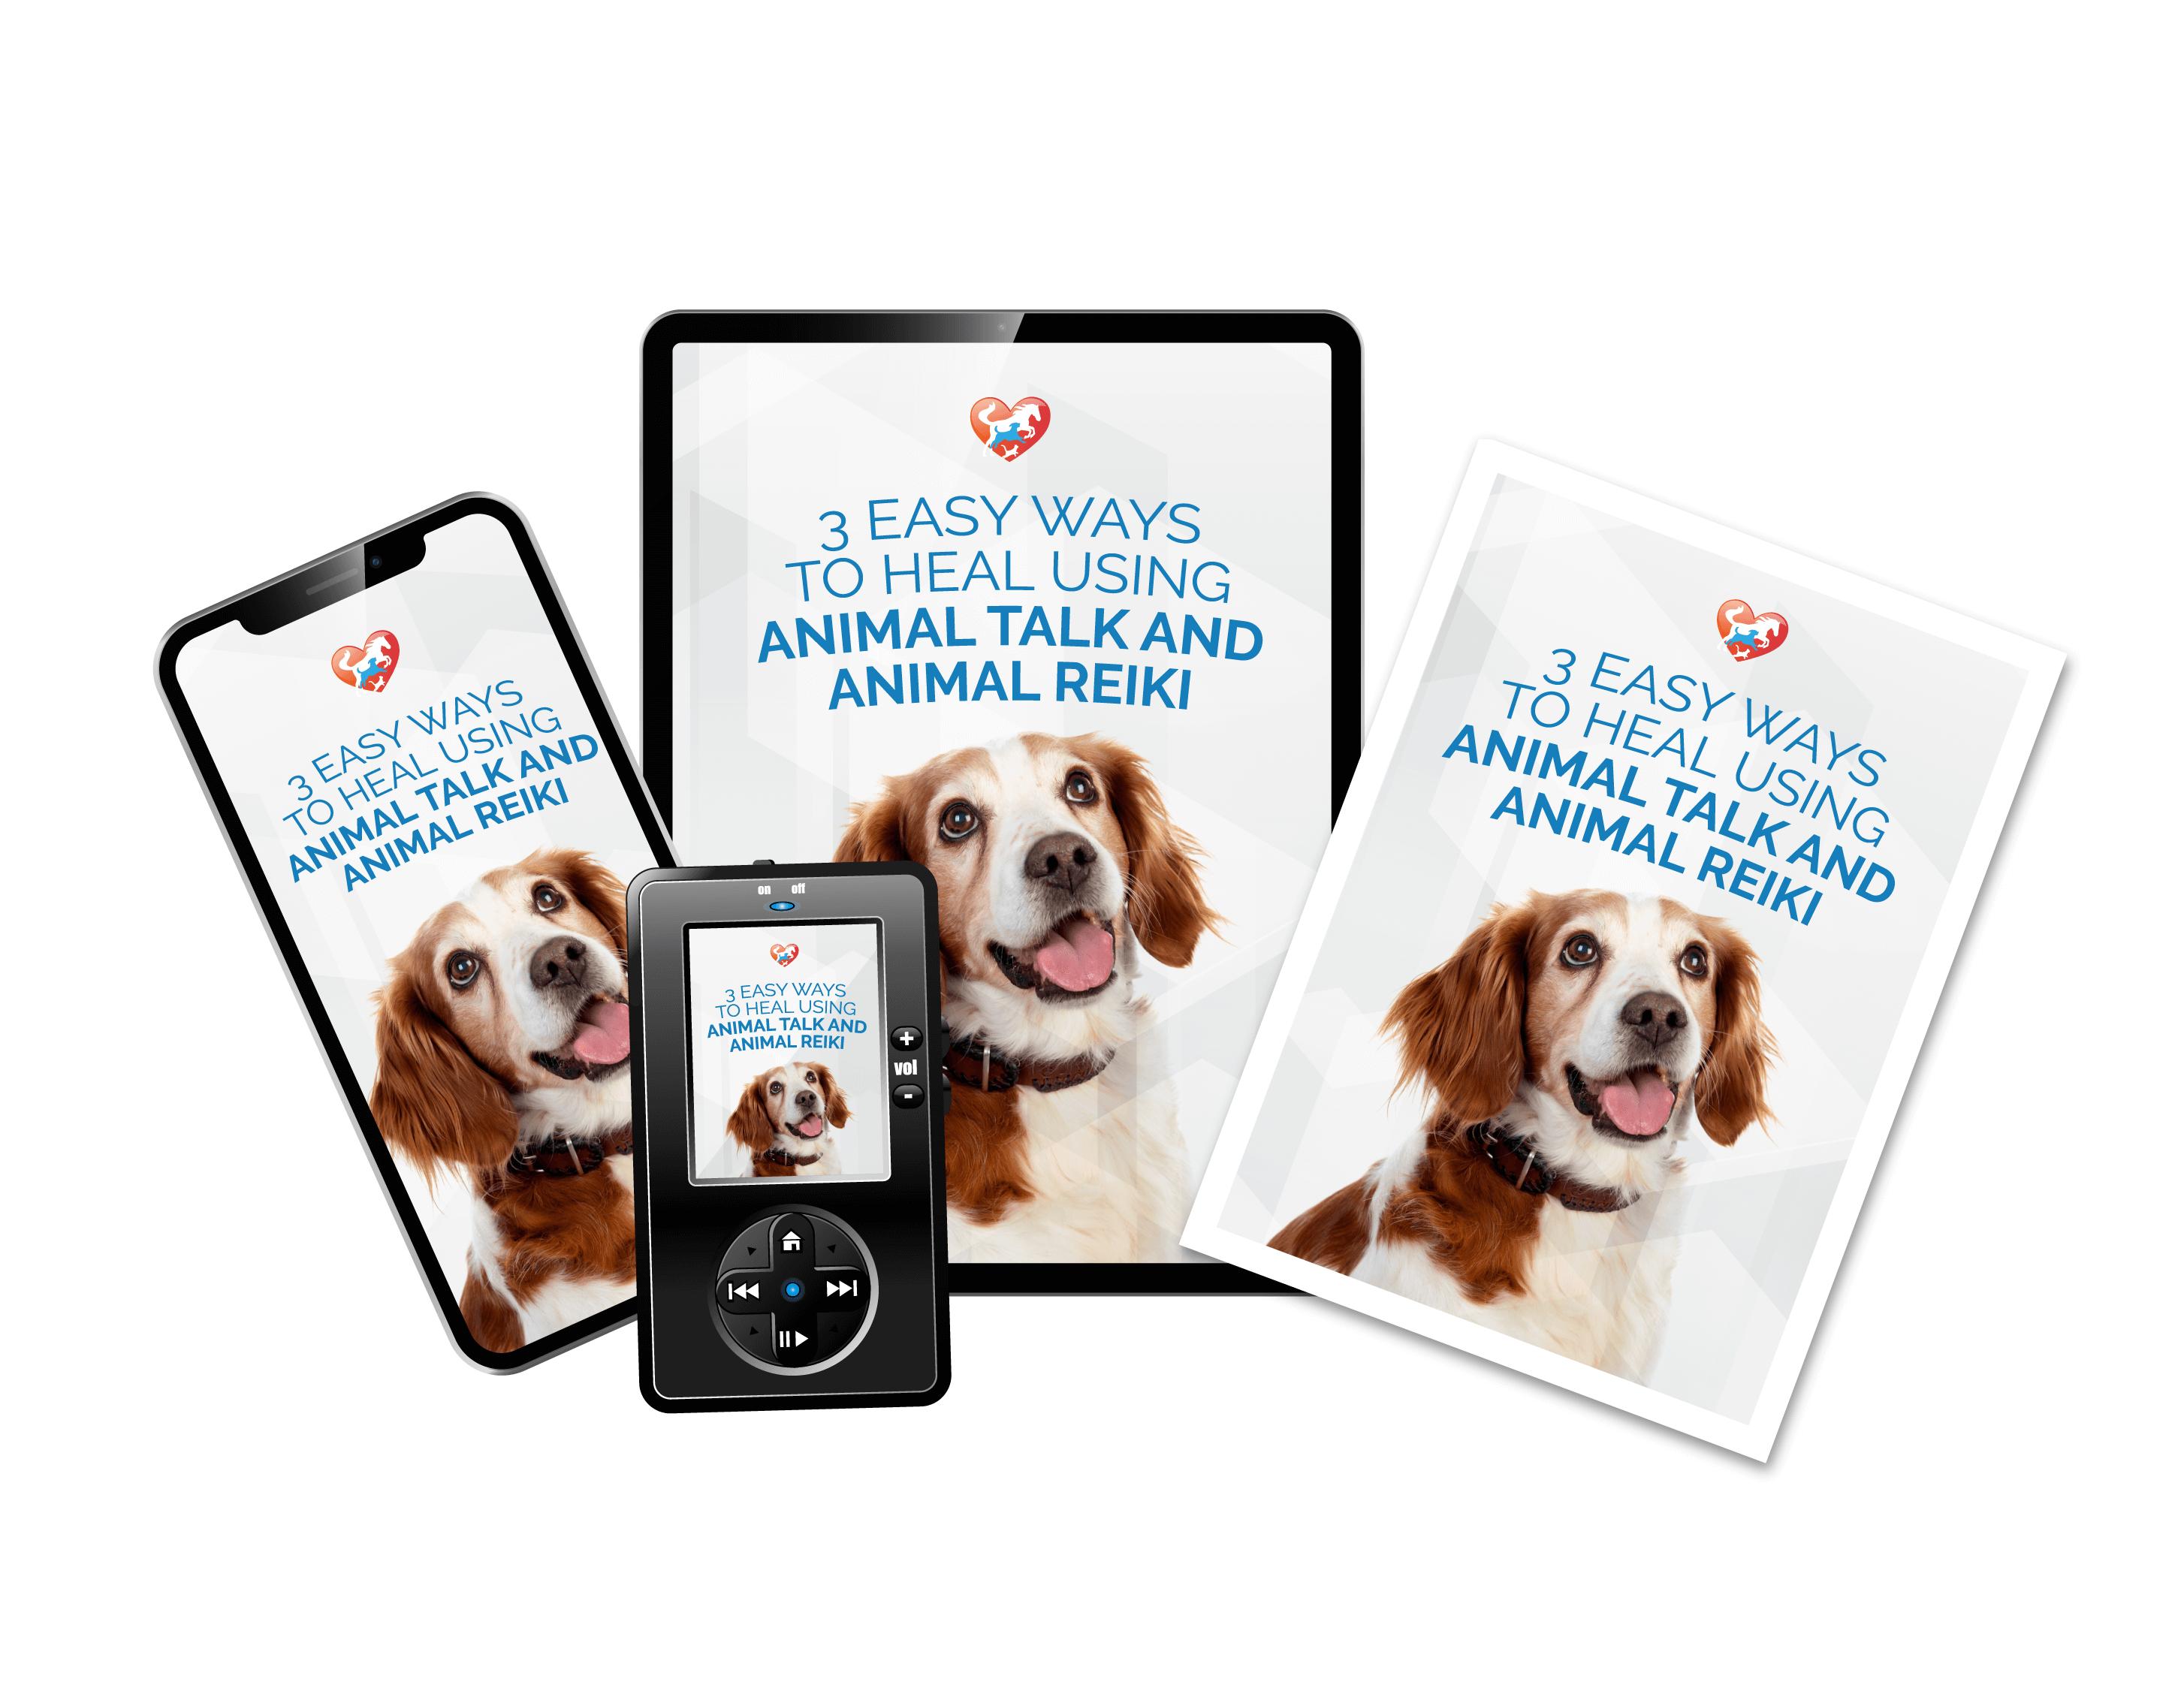 3 Easy Ways to Heal Animals Using Animal Talk and Animal Reiki - img (1)